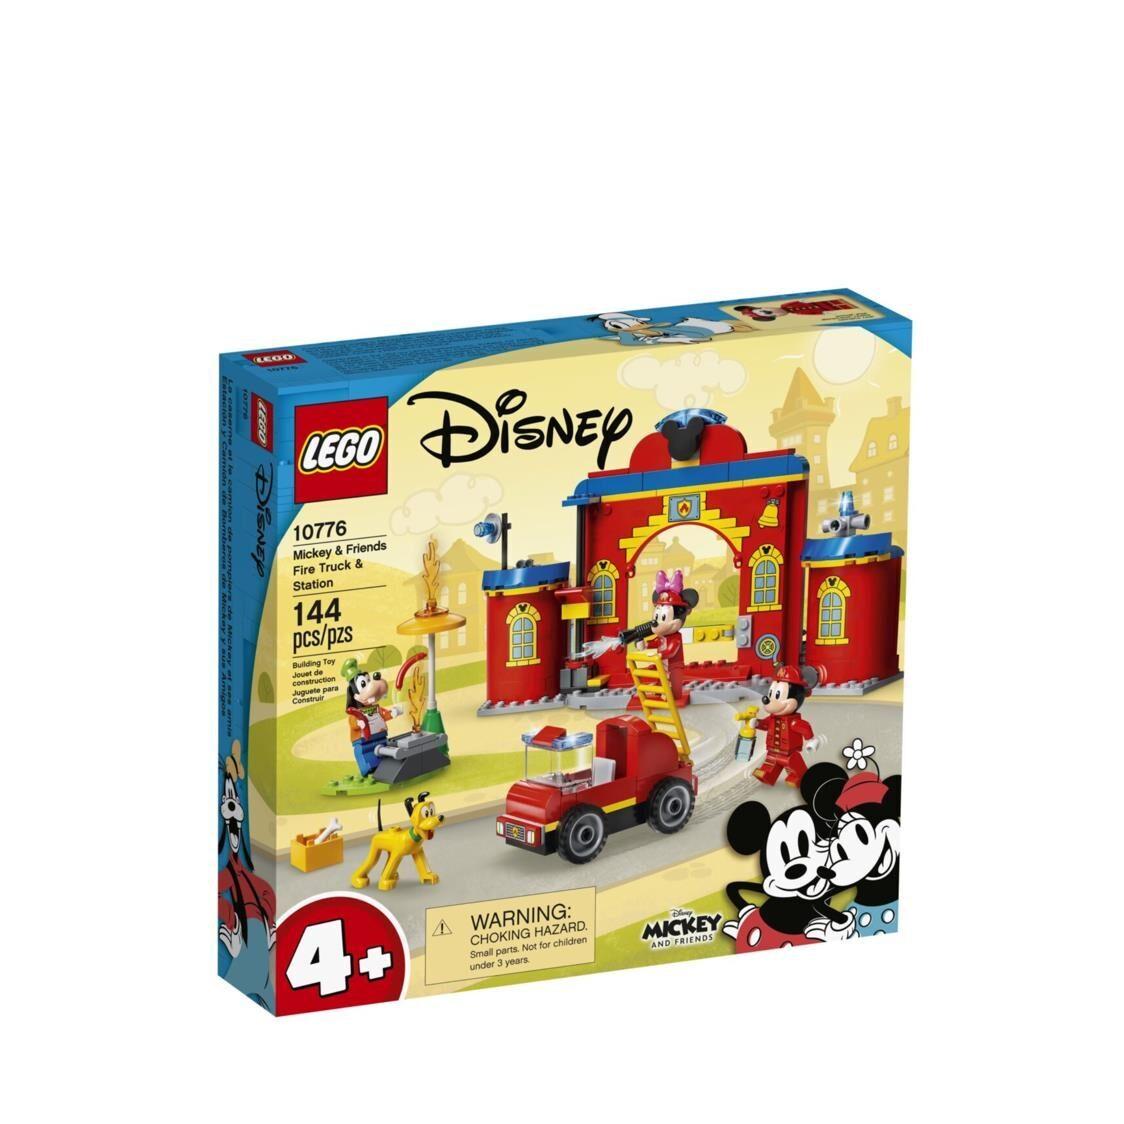 LEGO Mickey  Friends - Mickey  Friends Fire Truck  Station 10776